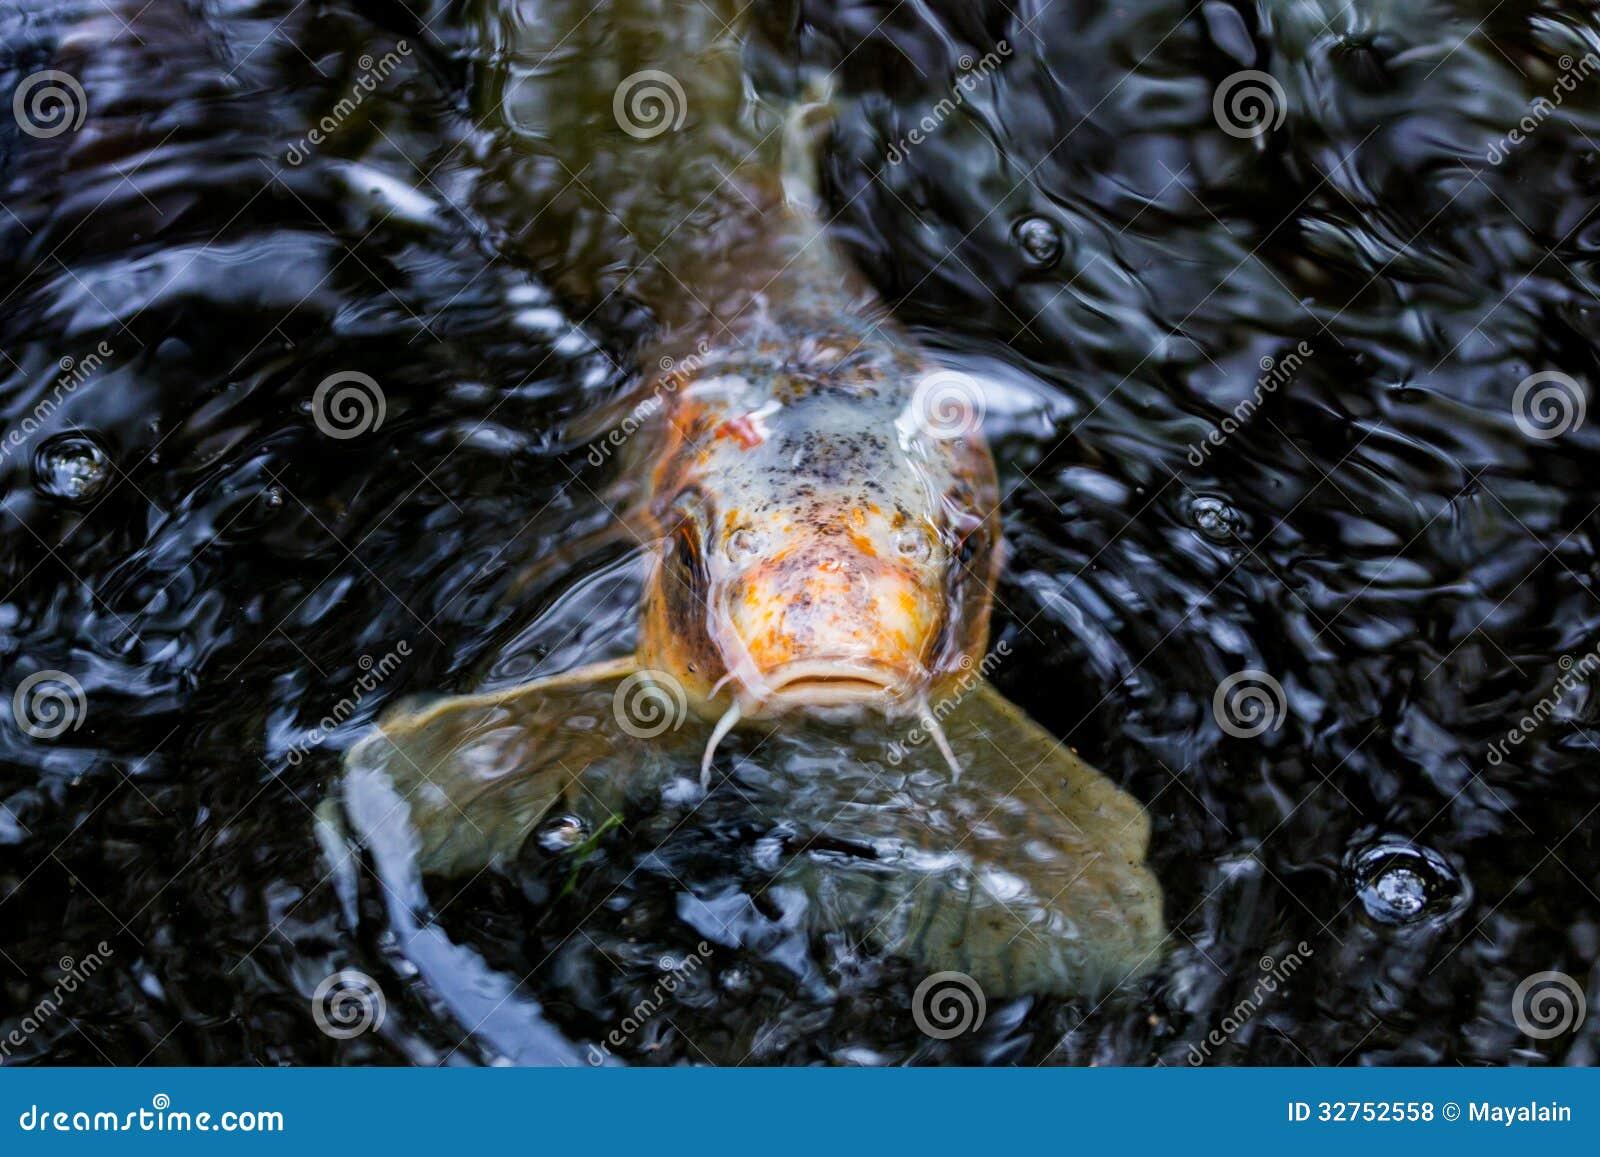 Koi carp royalty free stock photos image 32752558 for Fraie carpe koi